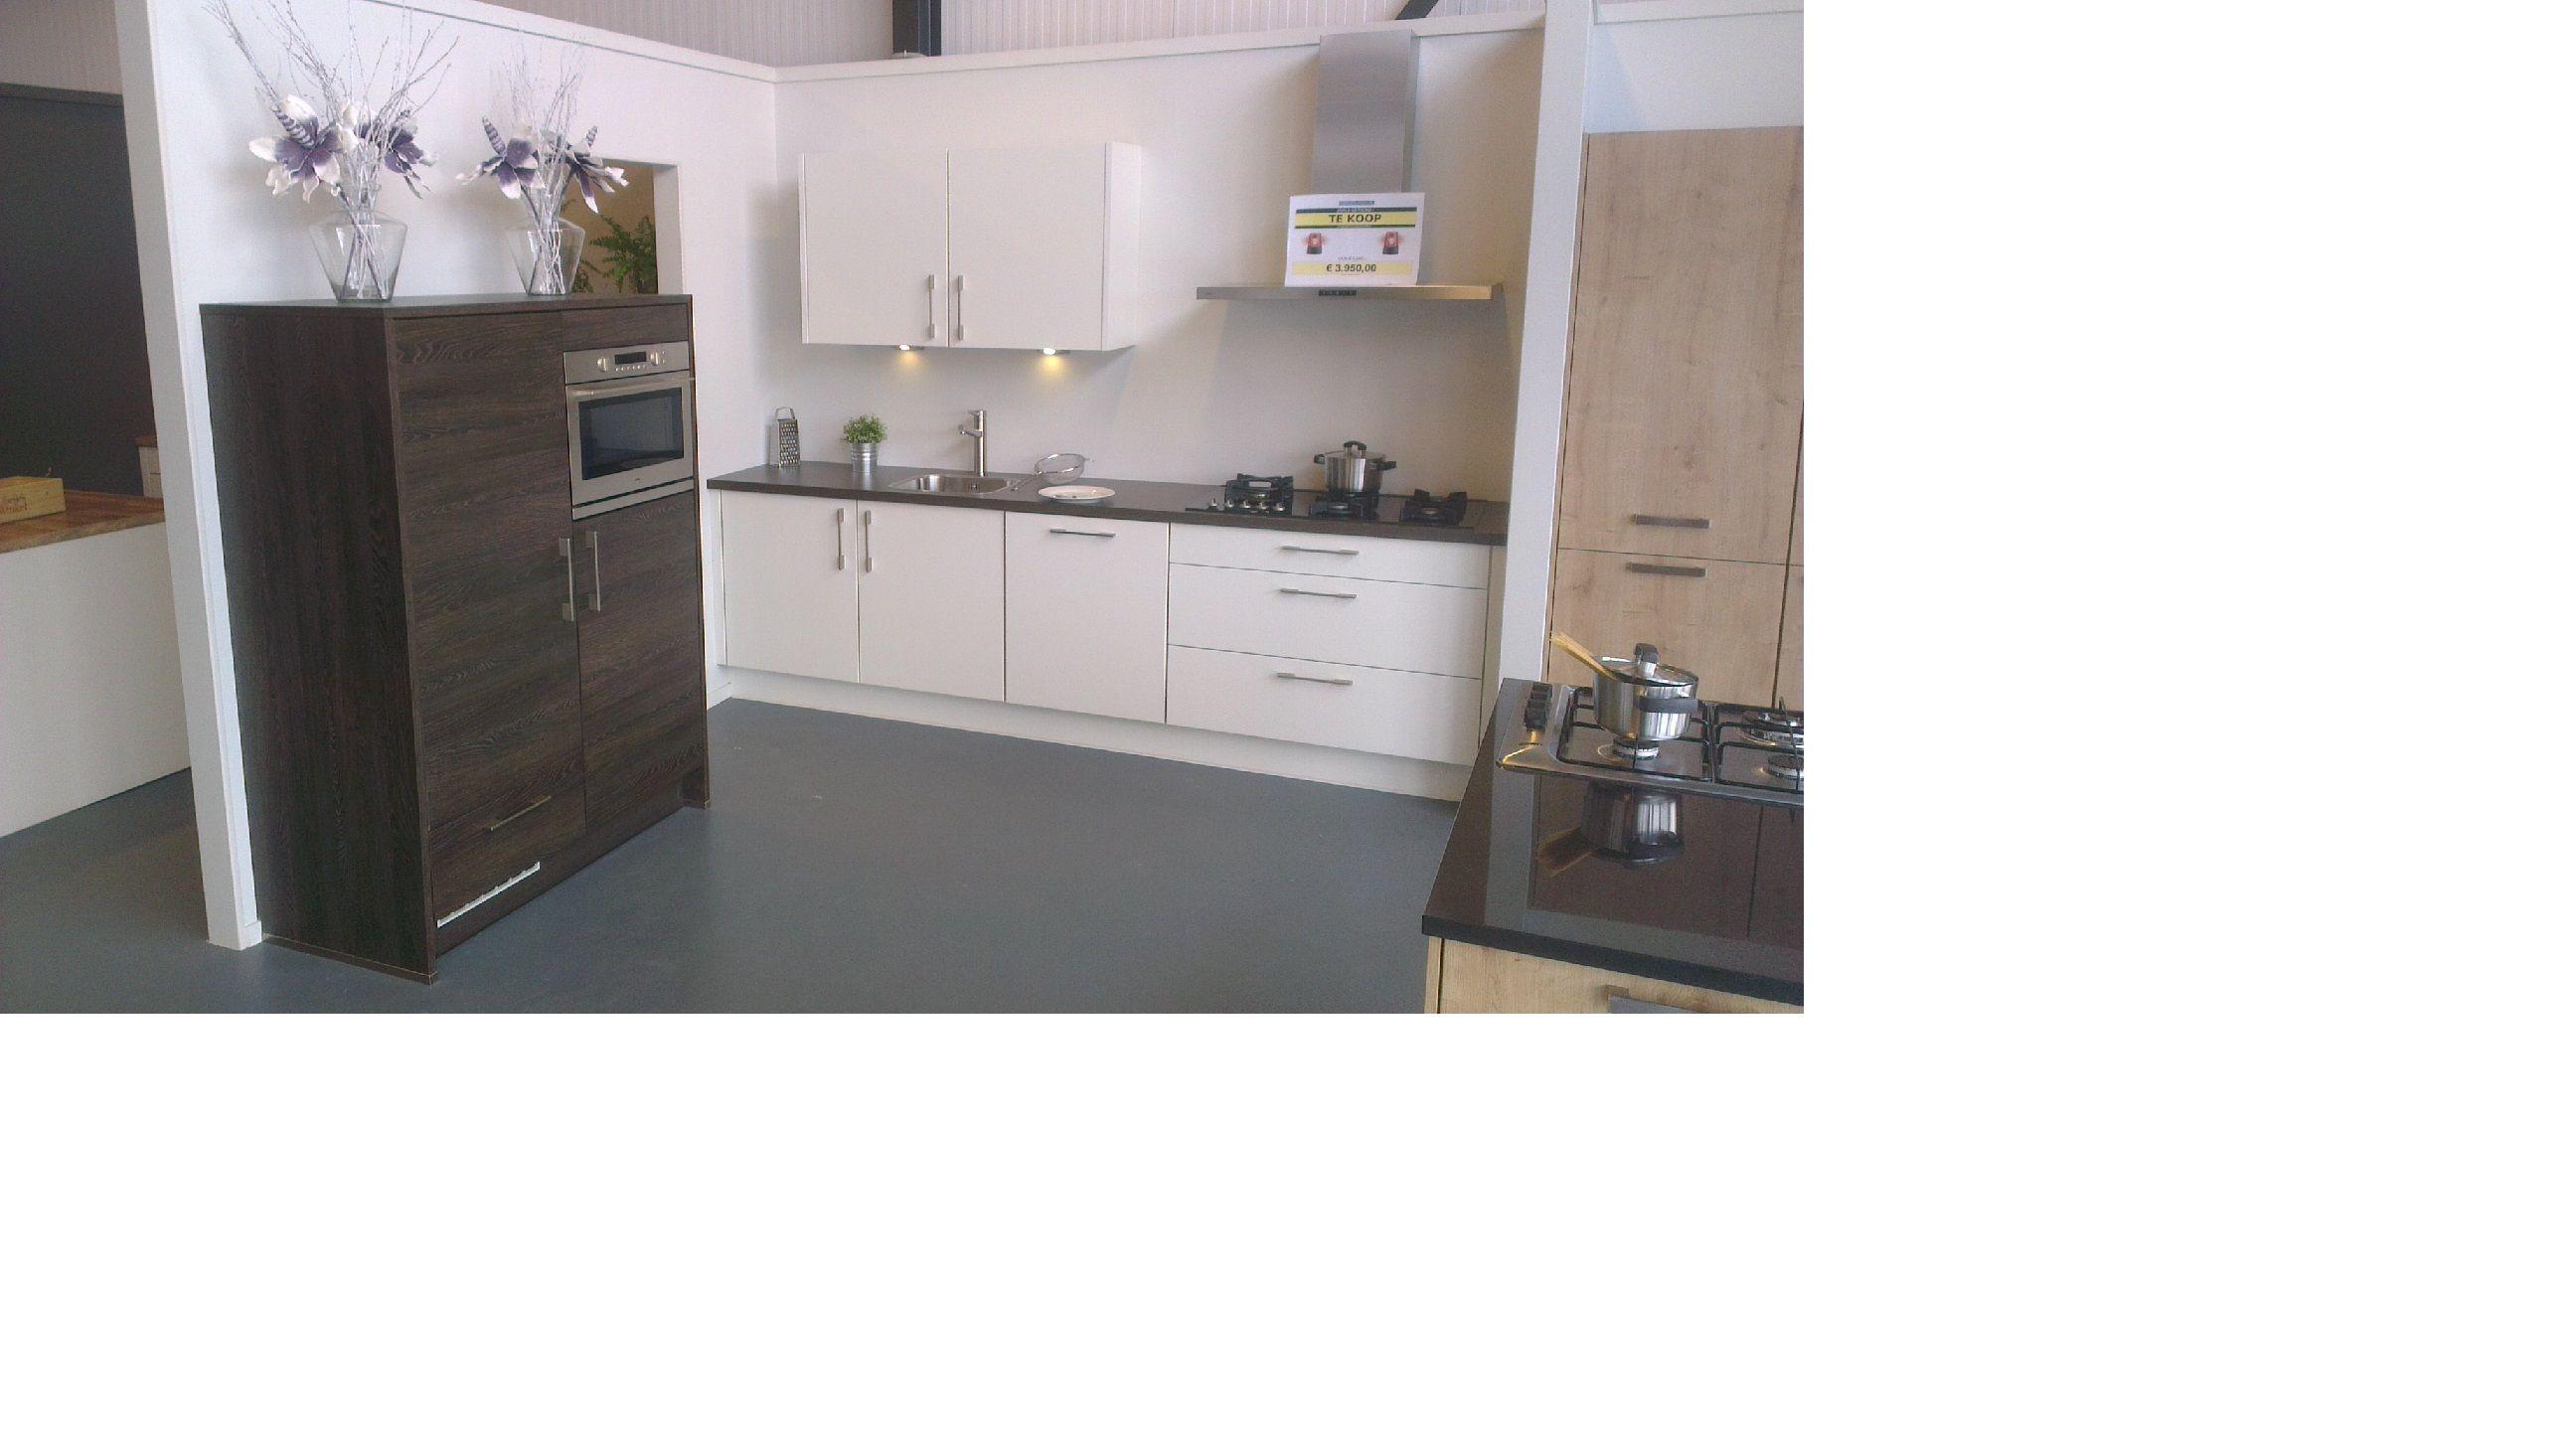 Keuken Kastenwand Te Koop : keuken 6 50335 mat wit gelakte keuken met kastenwand in eiken marron